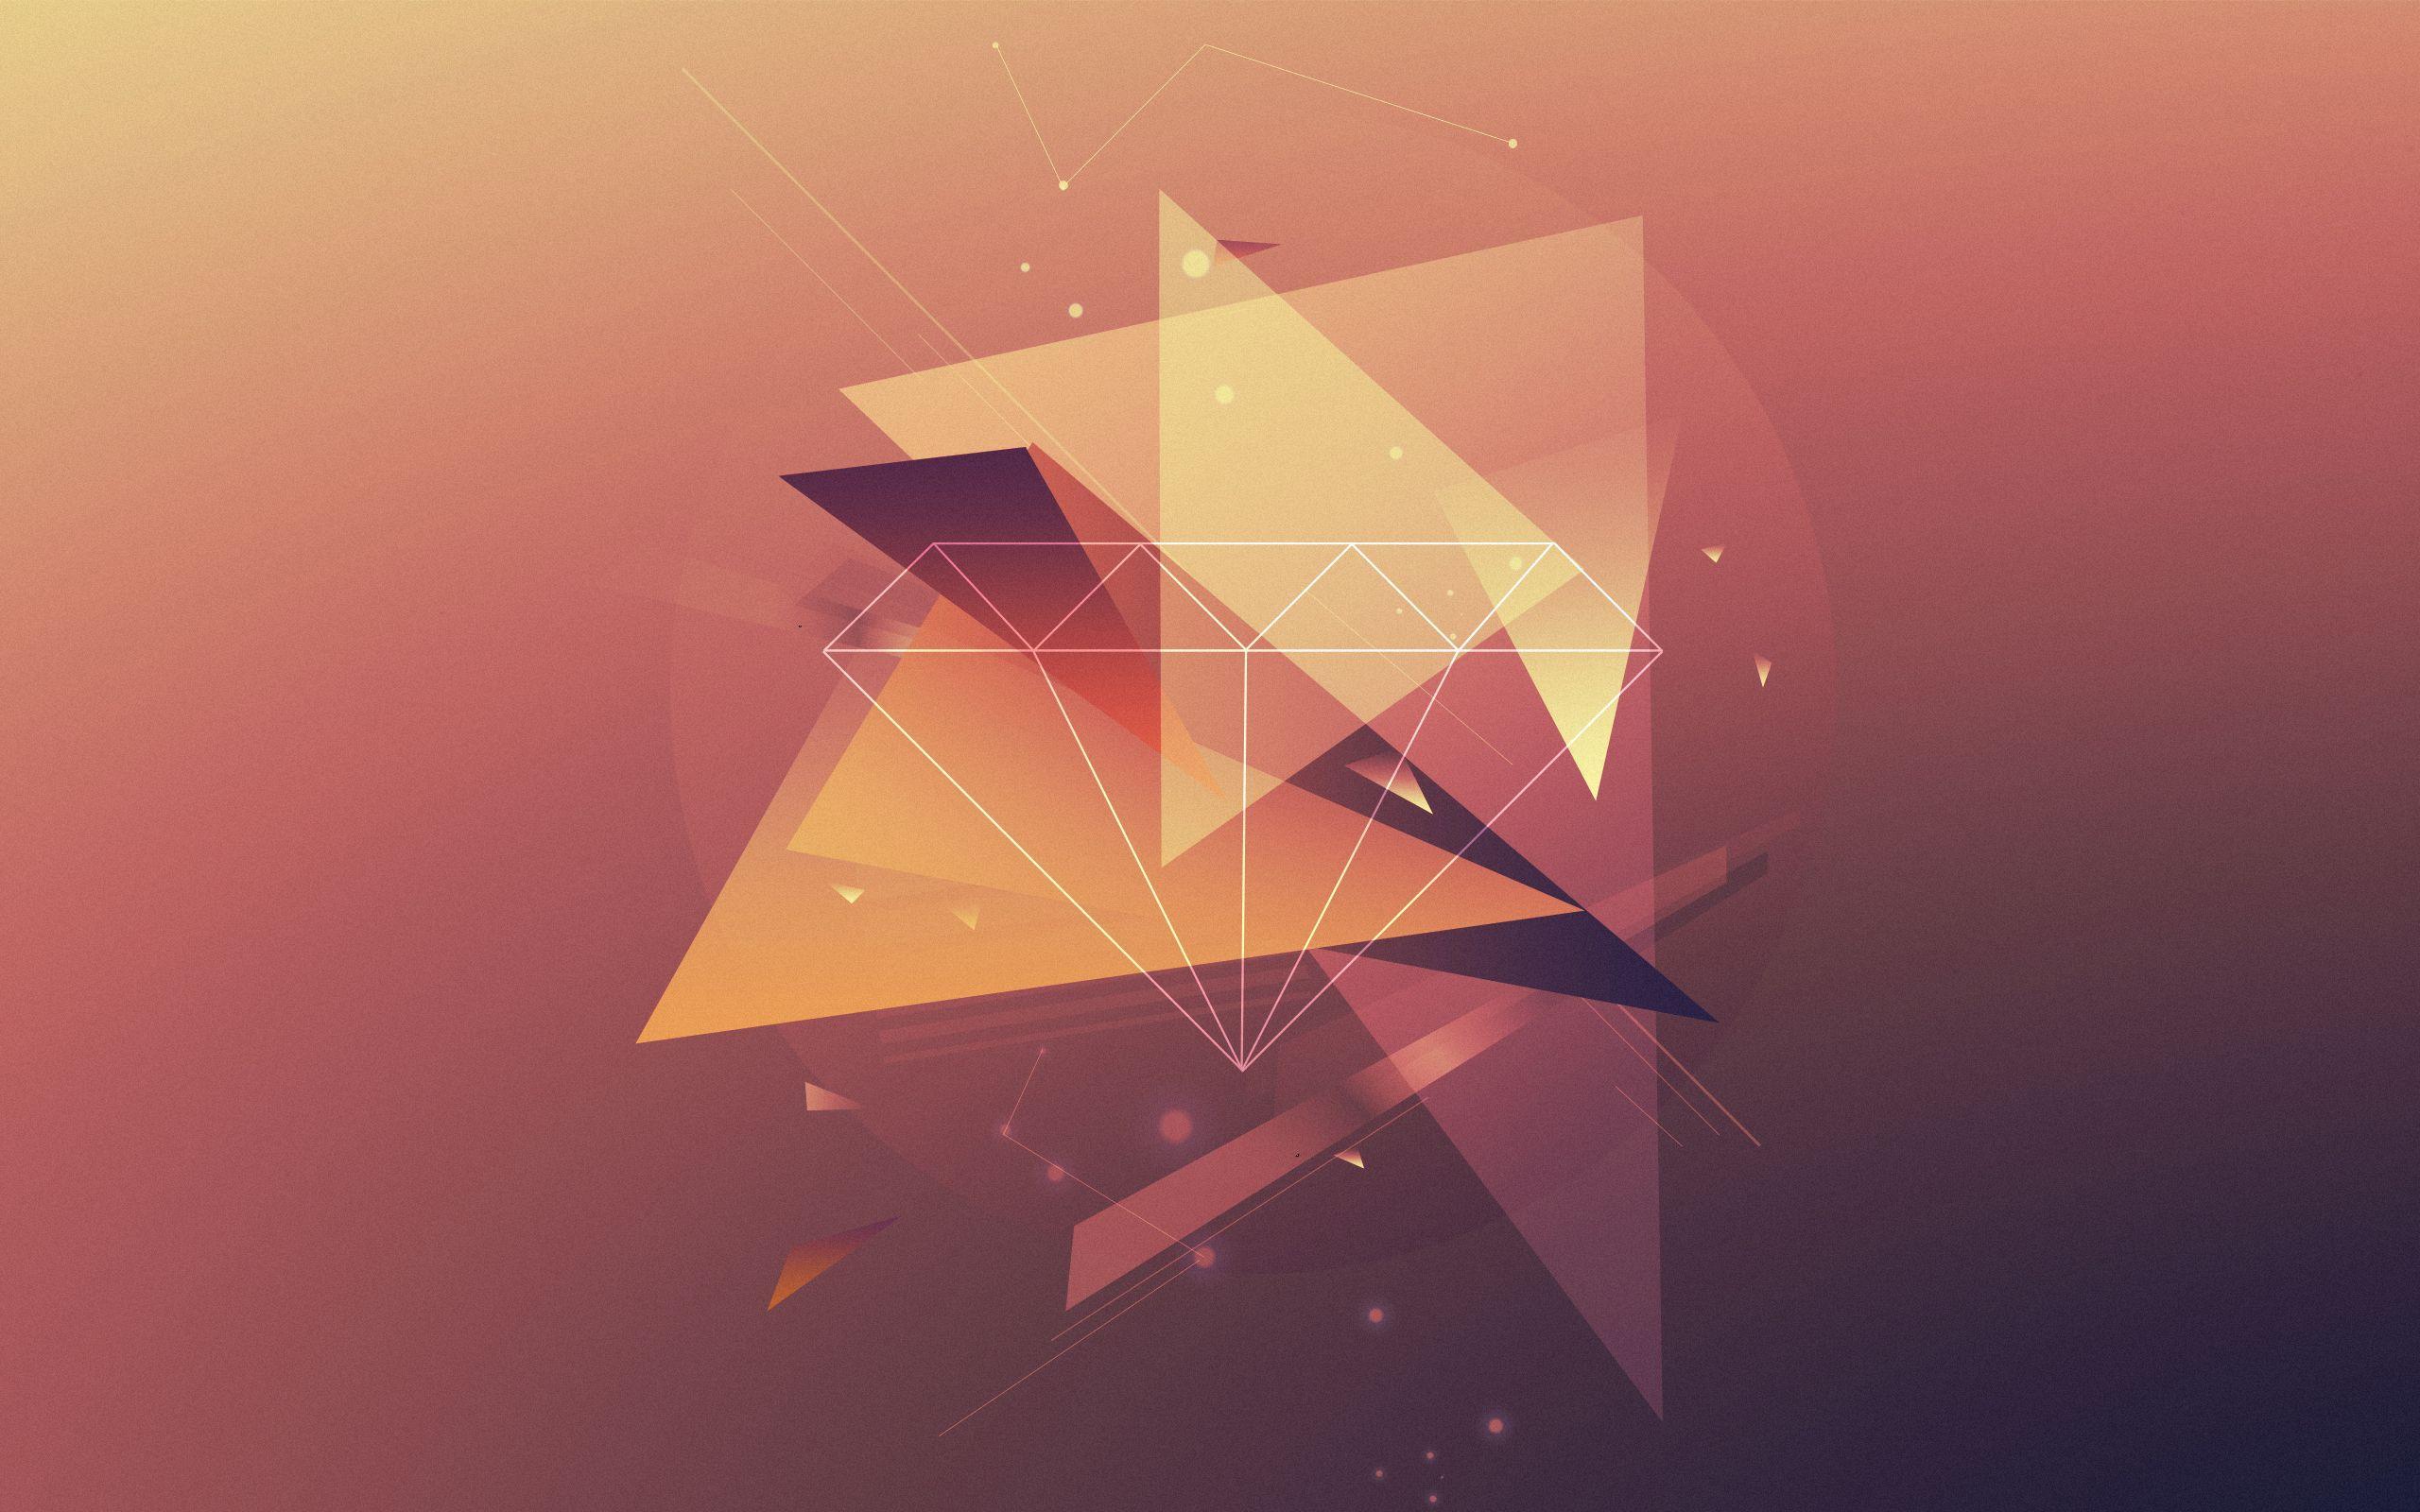 Image Result For Geometry Wallpaper Geometric Art Geometric Poster Illustration Design